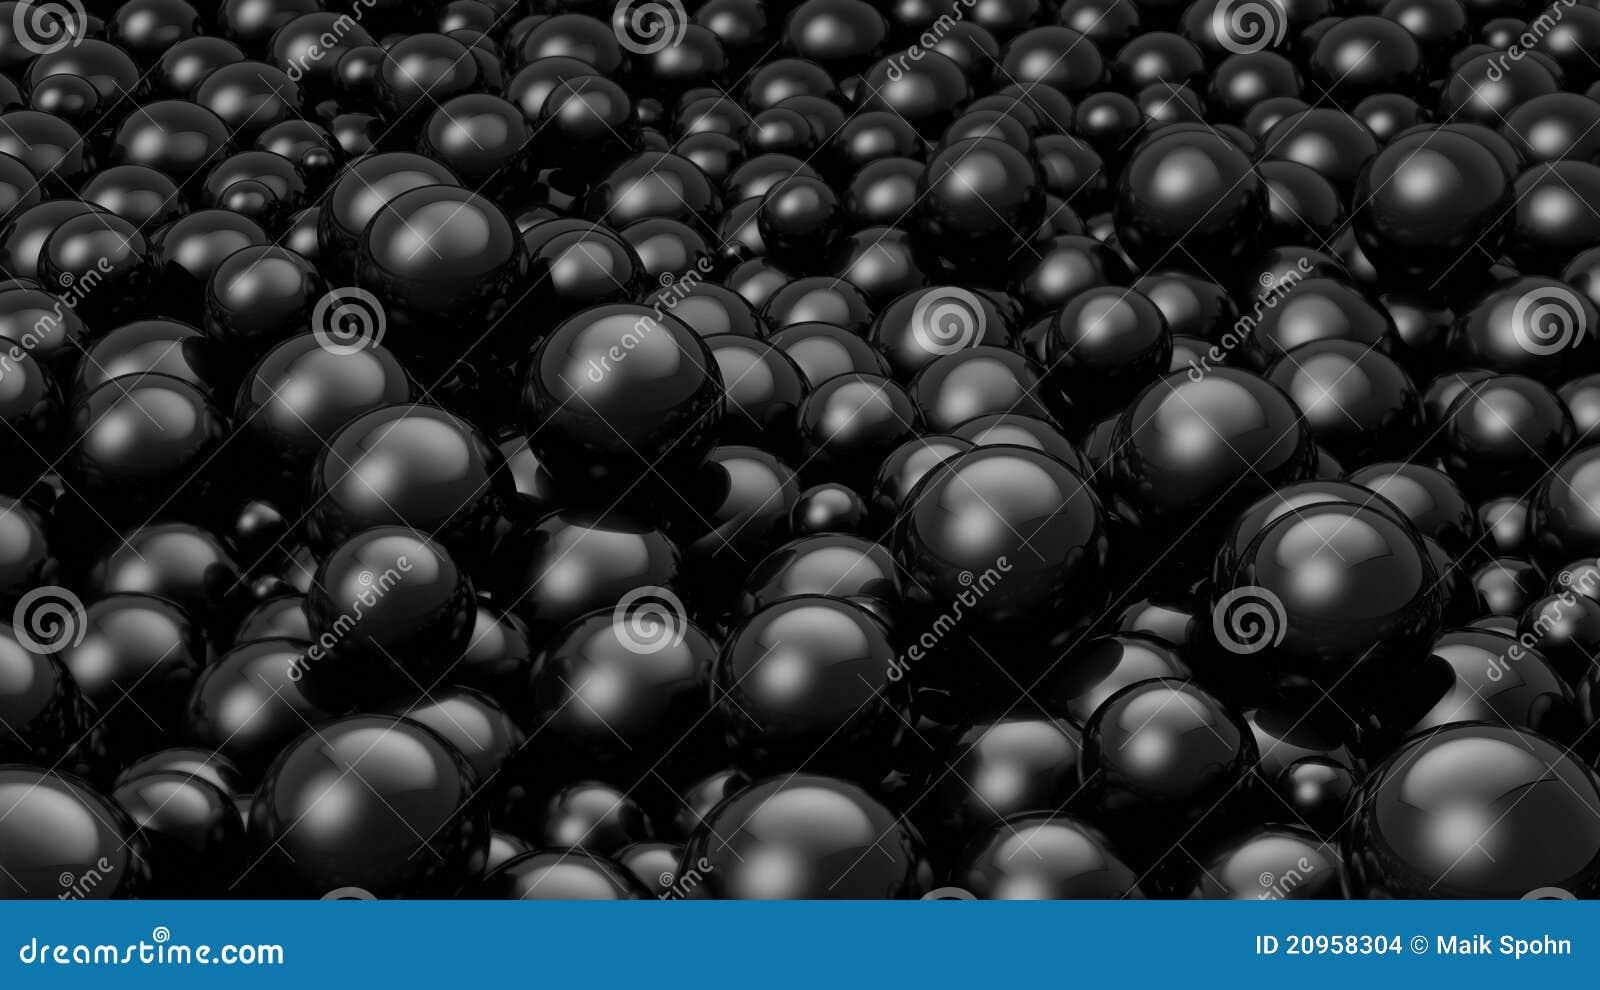 Balls Black